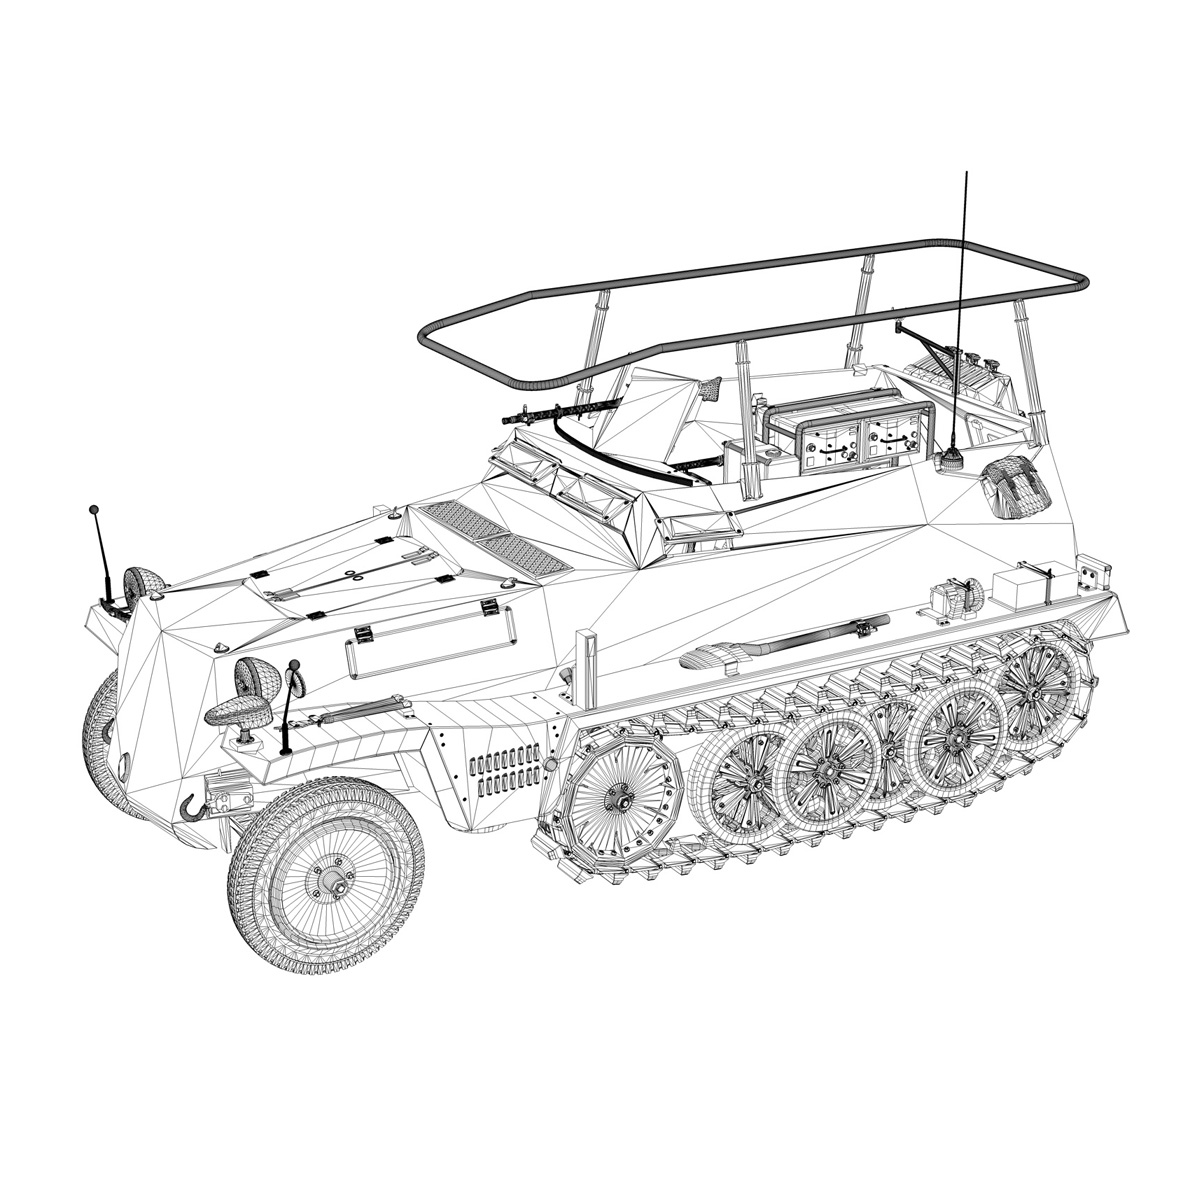 sdkfz 250 – command halftrack 3d model 3ds fbx c4d lwo obj 251678